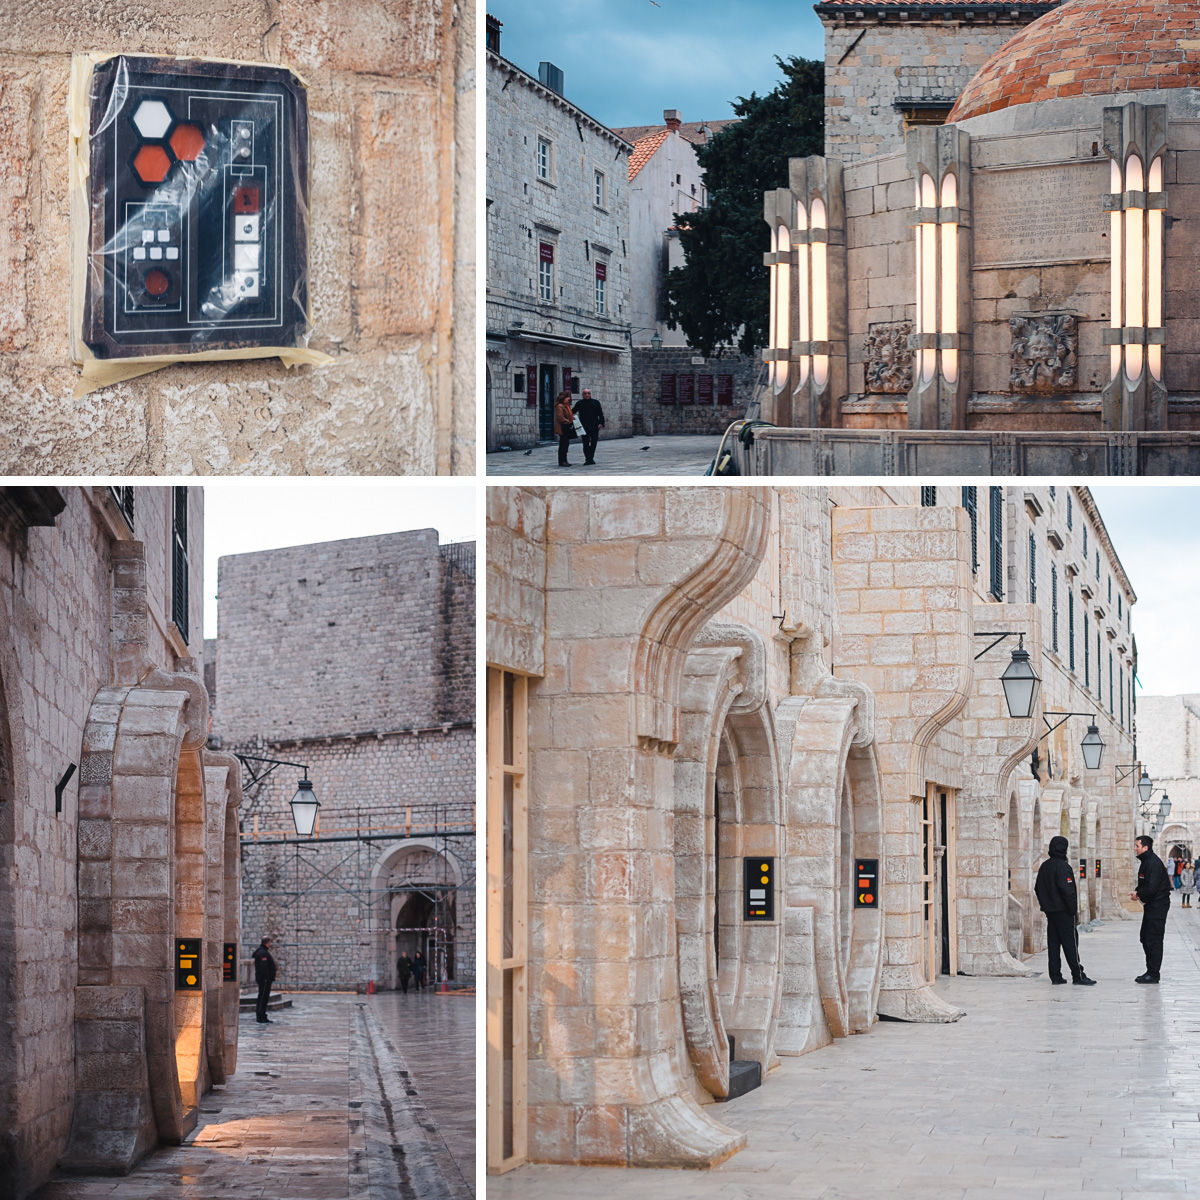 Star Wars Episode VIII in Dubrovnik